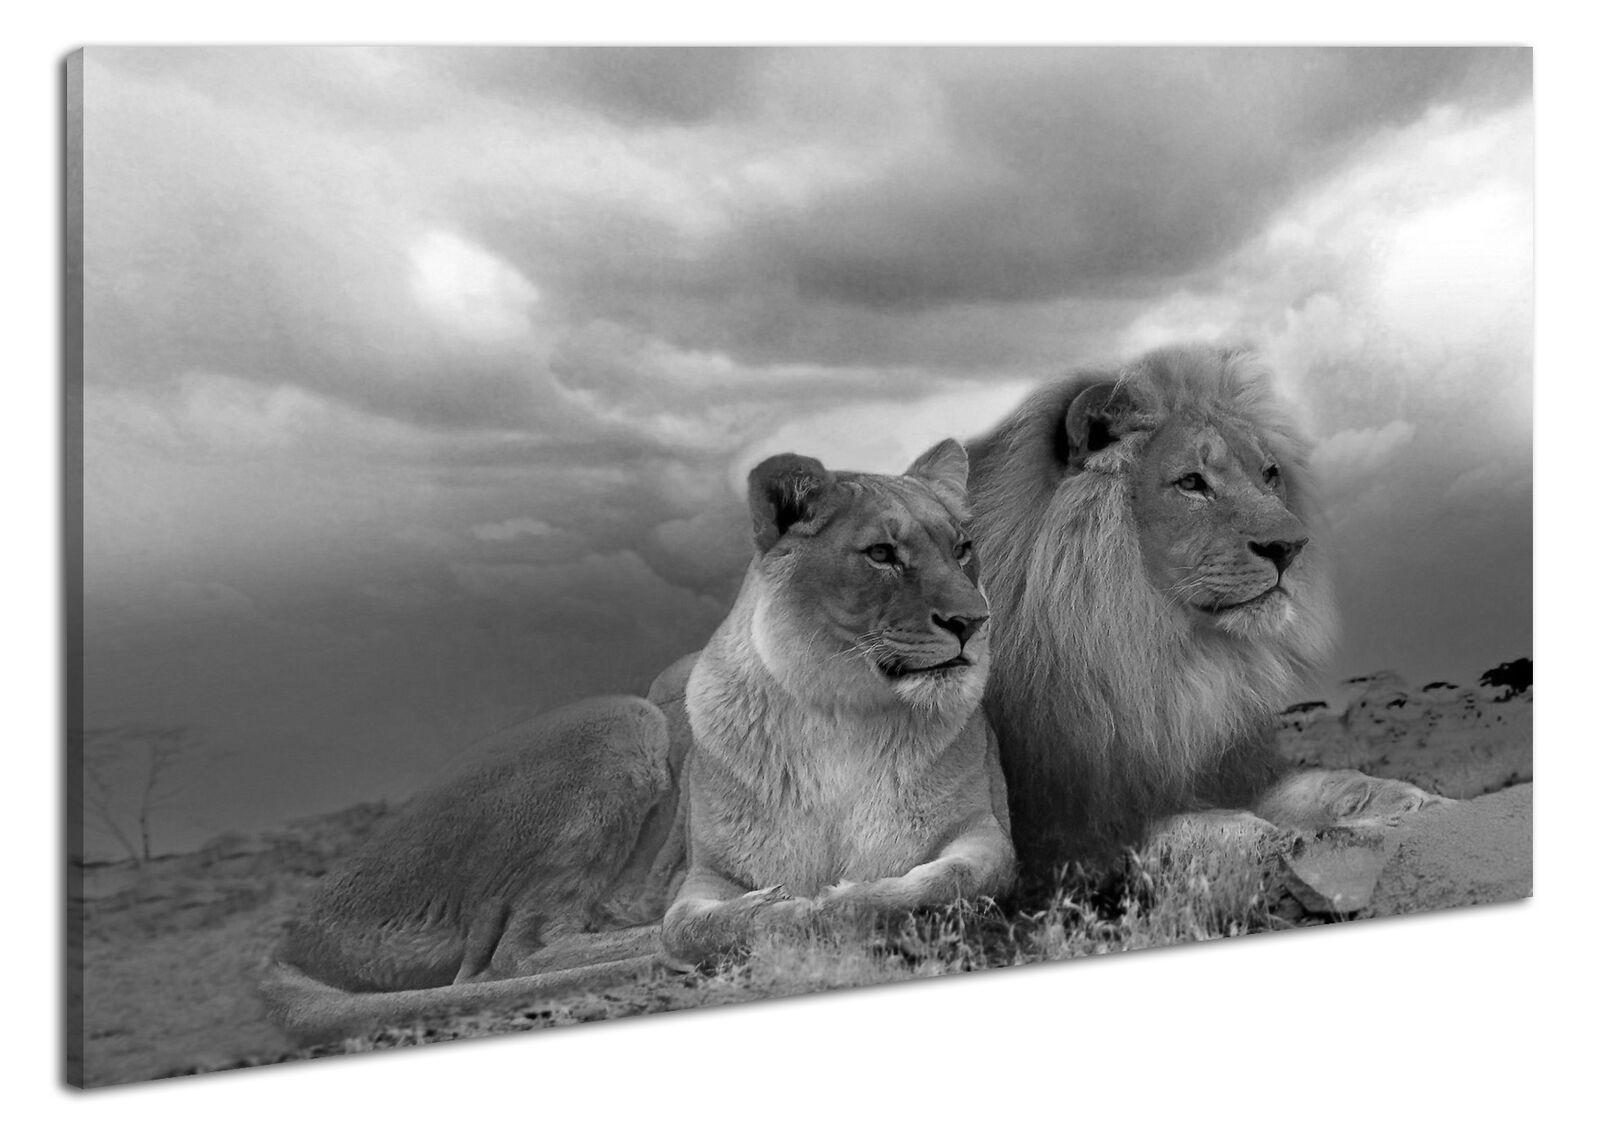 Leinwandbild Wandbild  Keilrahmen Löwen Afrika Safari Kunstdruck Landschaft